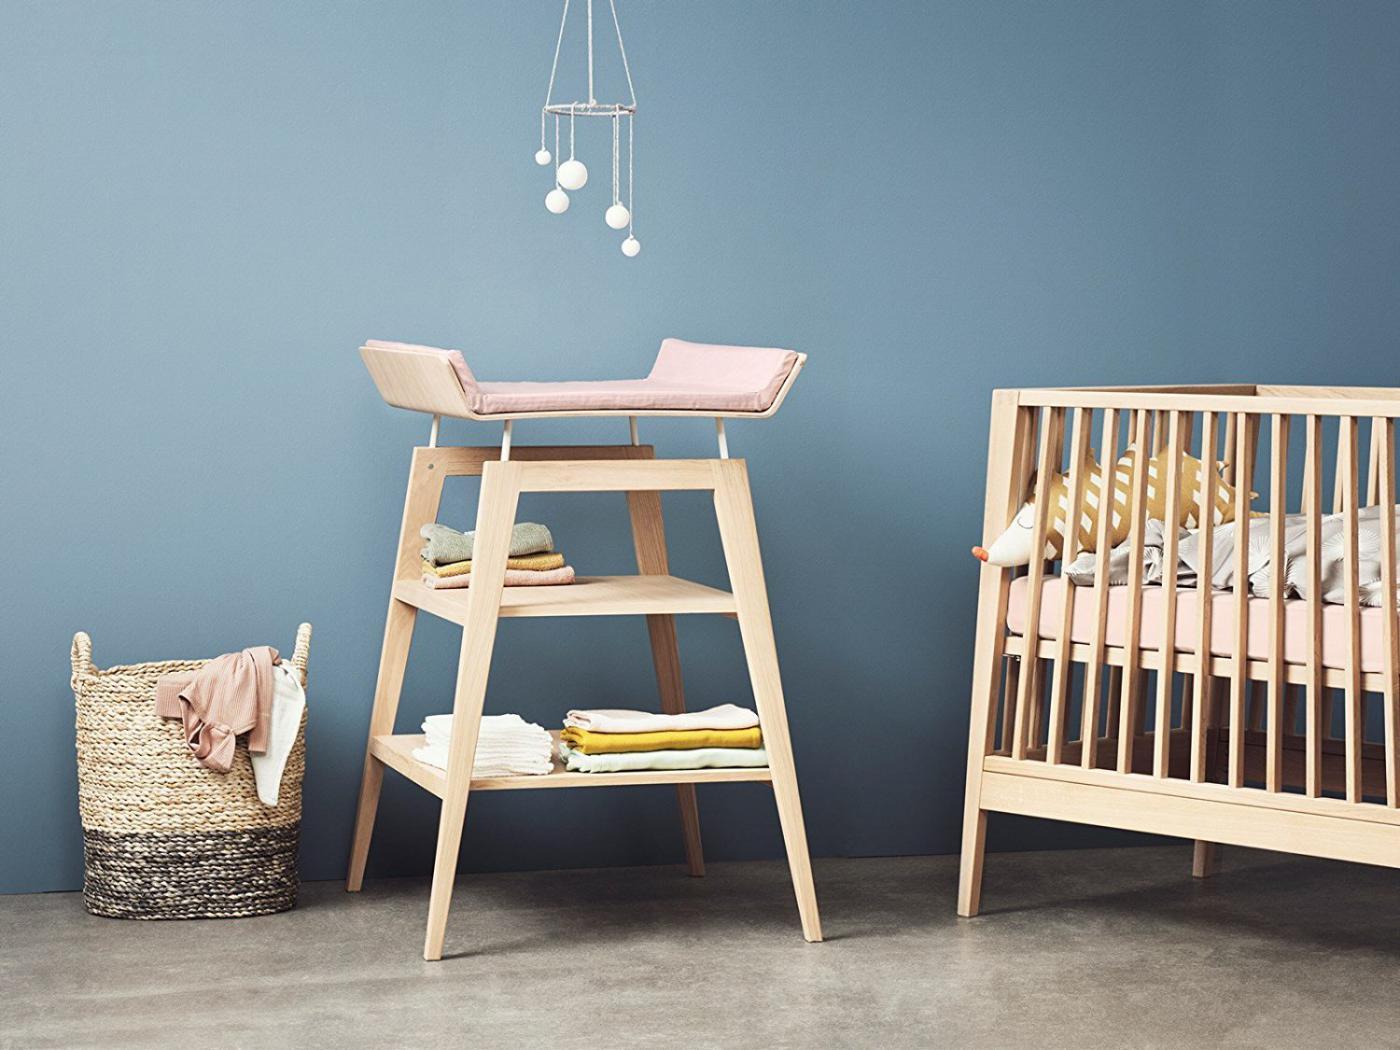 leander housse matelas langer rose p le pour table. Black Bedroom Furniture Sets. Home Design Ideas